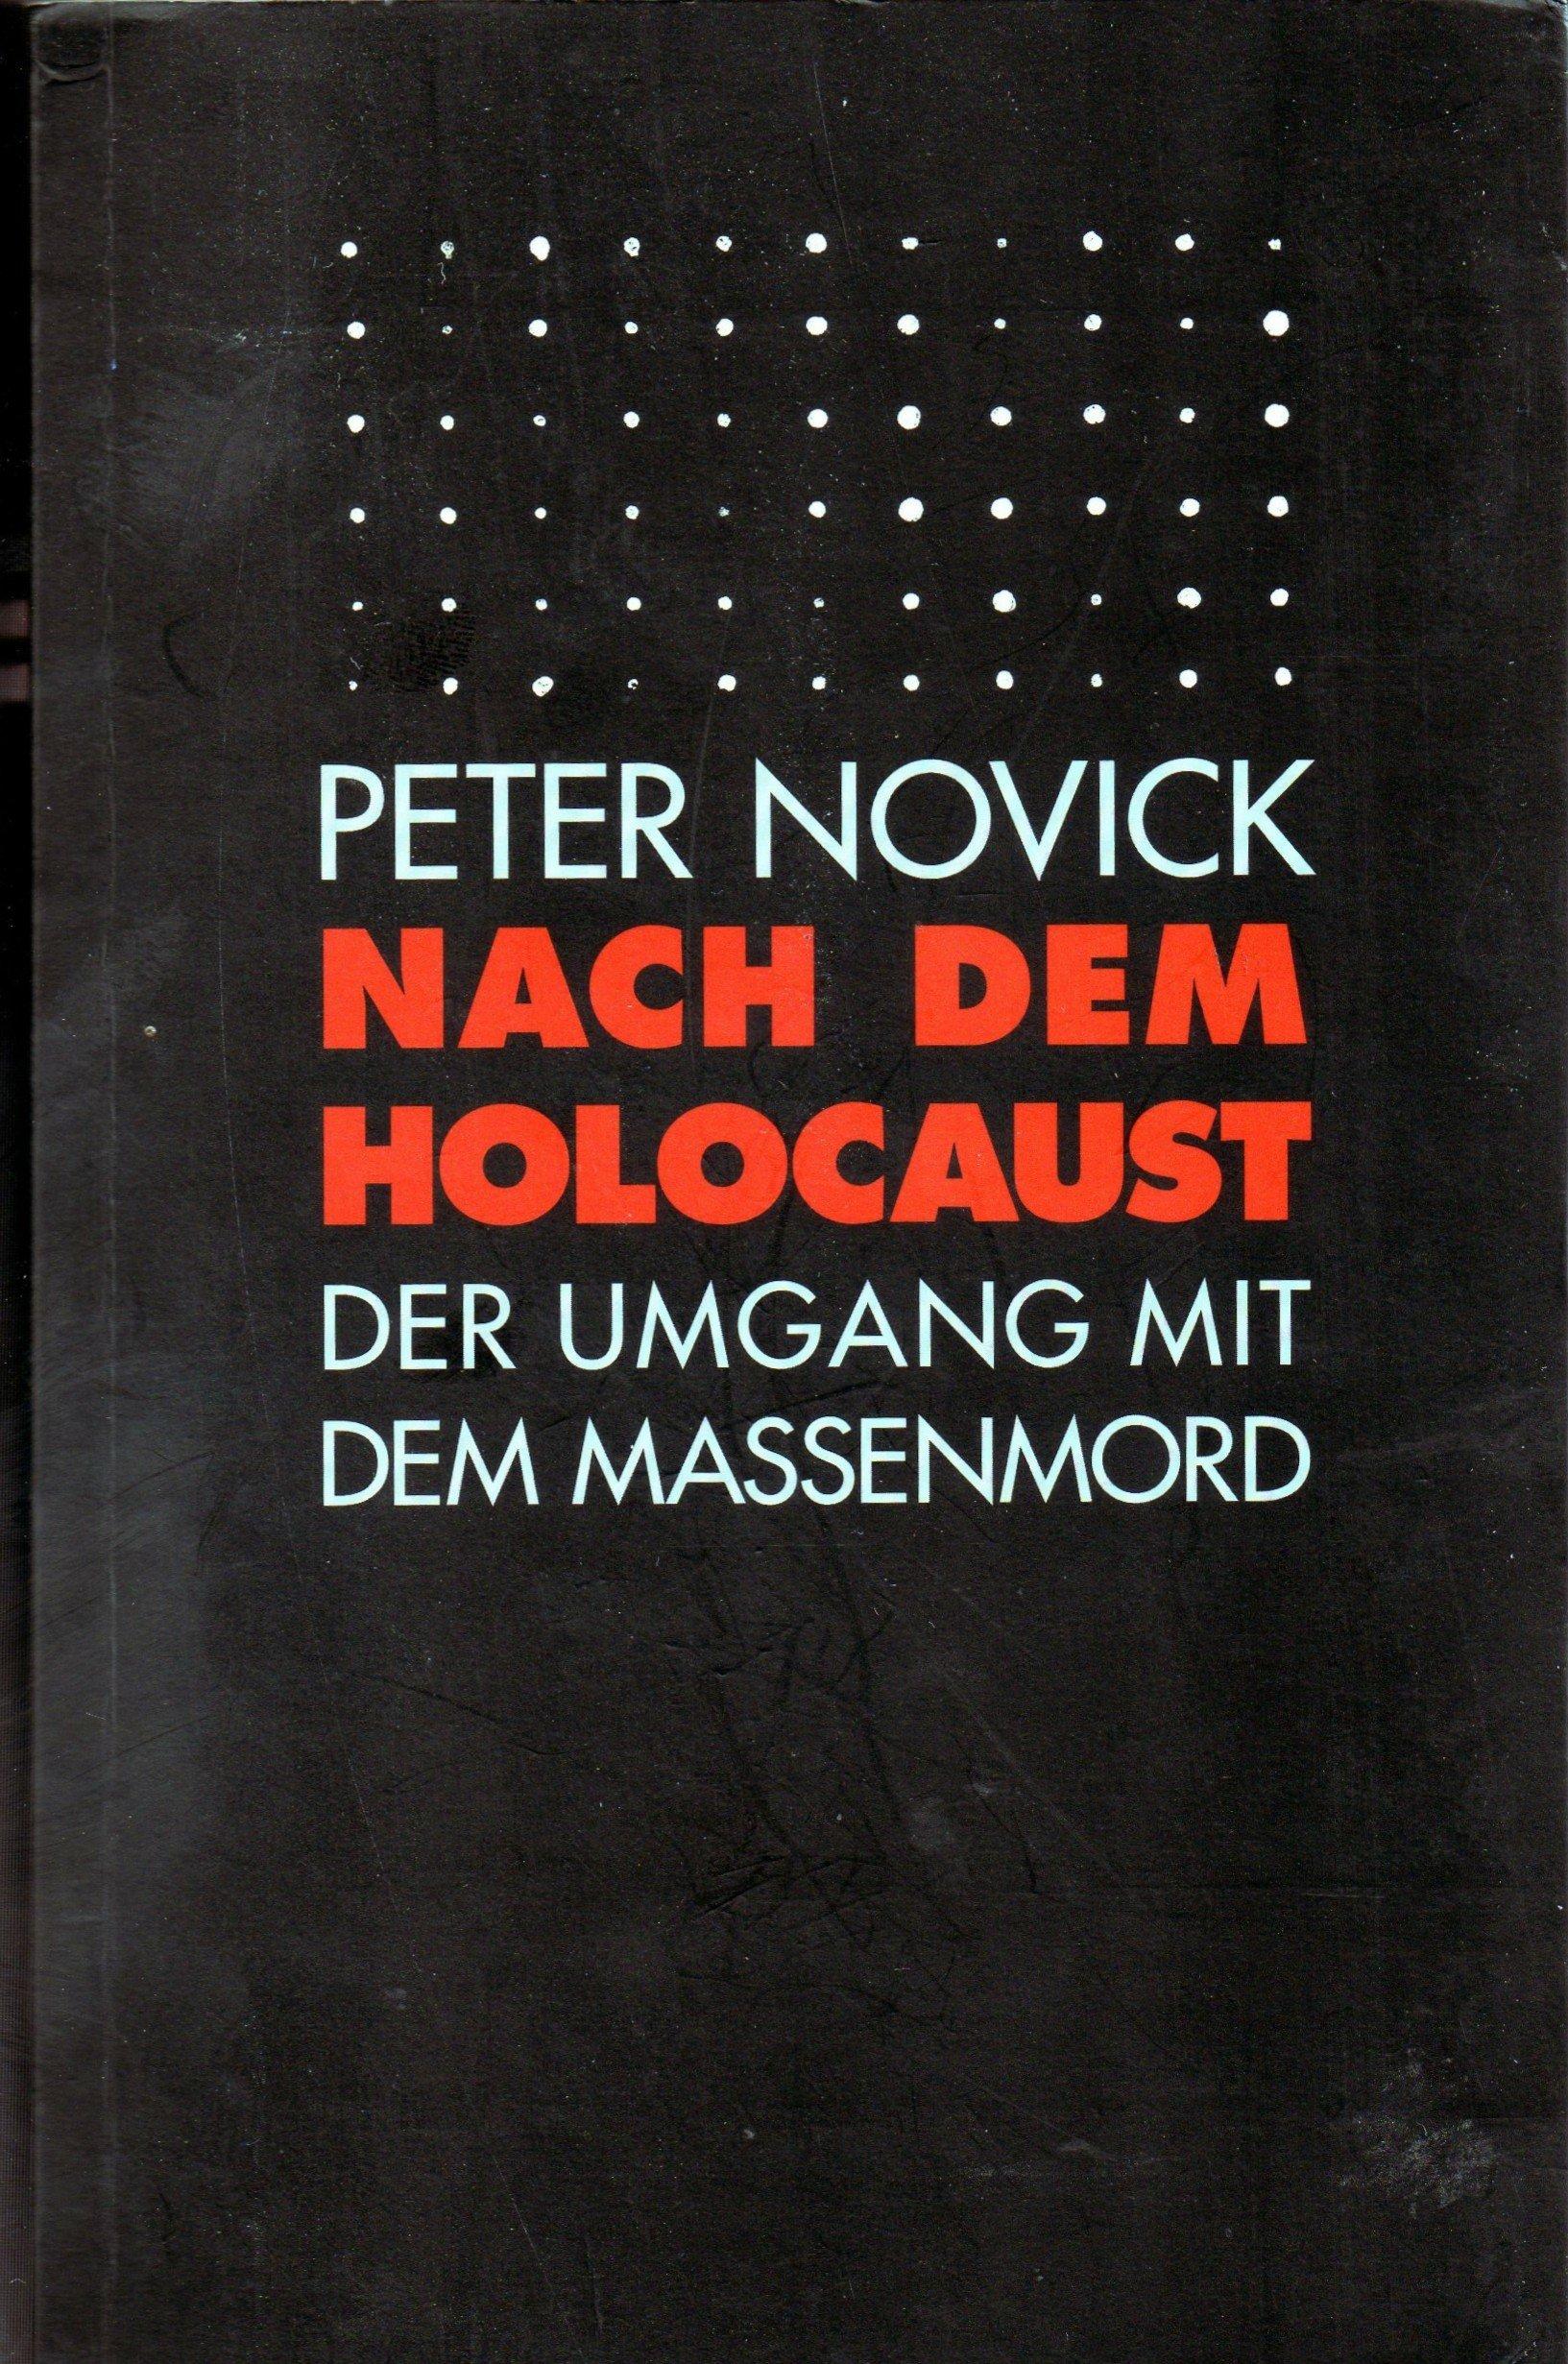 Nach dem Holocaust Der Umgang mit dem Massenmord